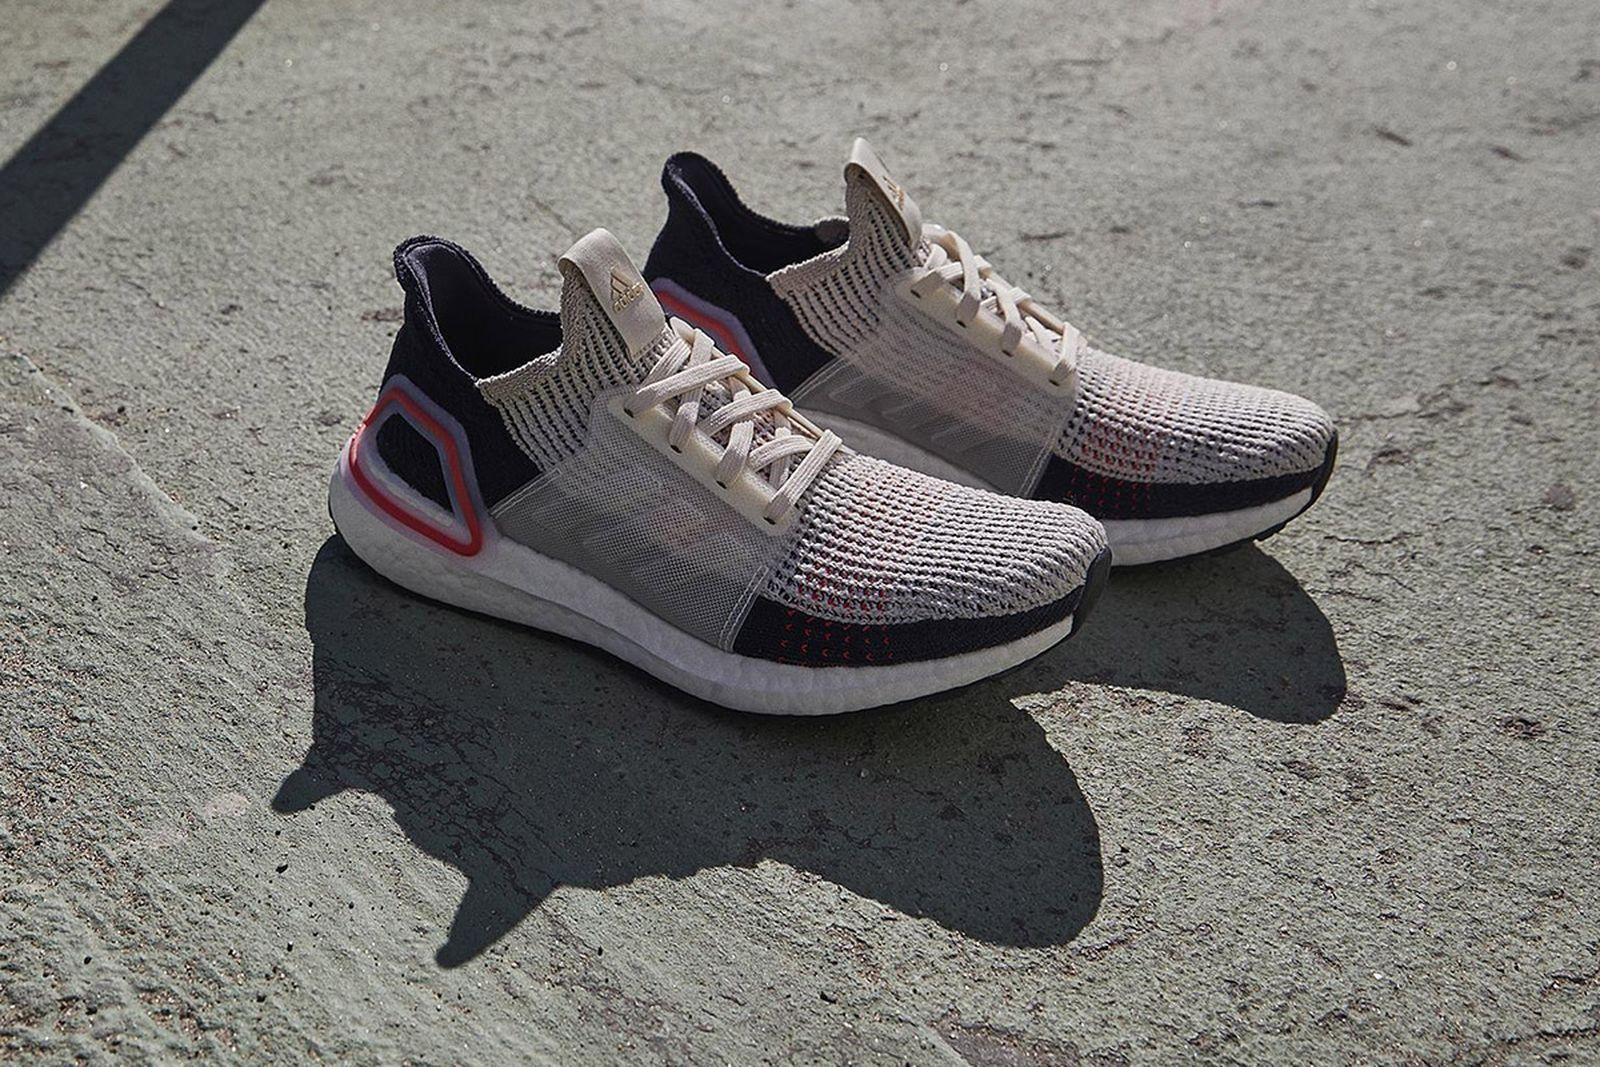 adidas ultra boost 19 interview Hoka One One New Balance Nike